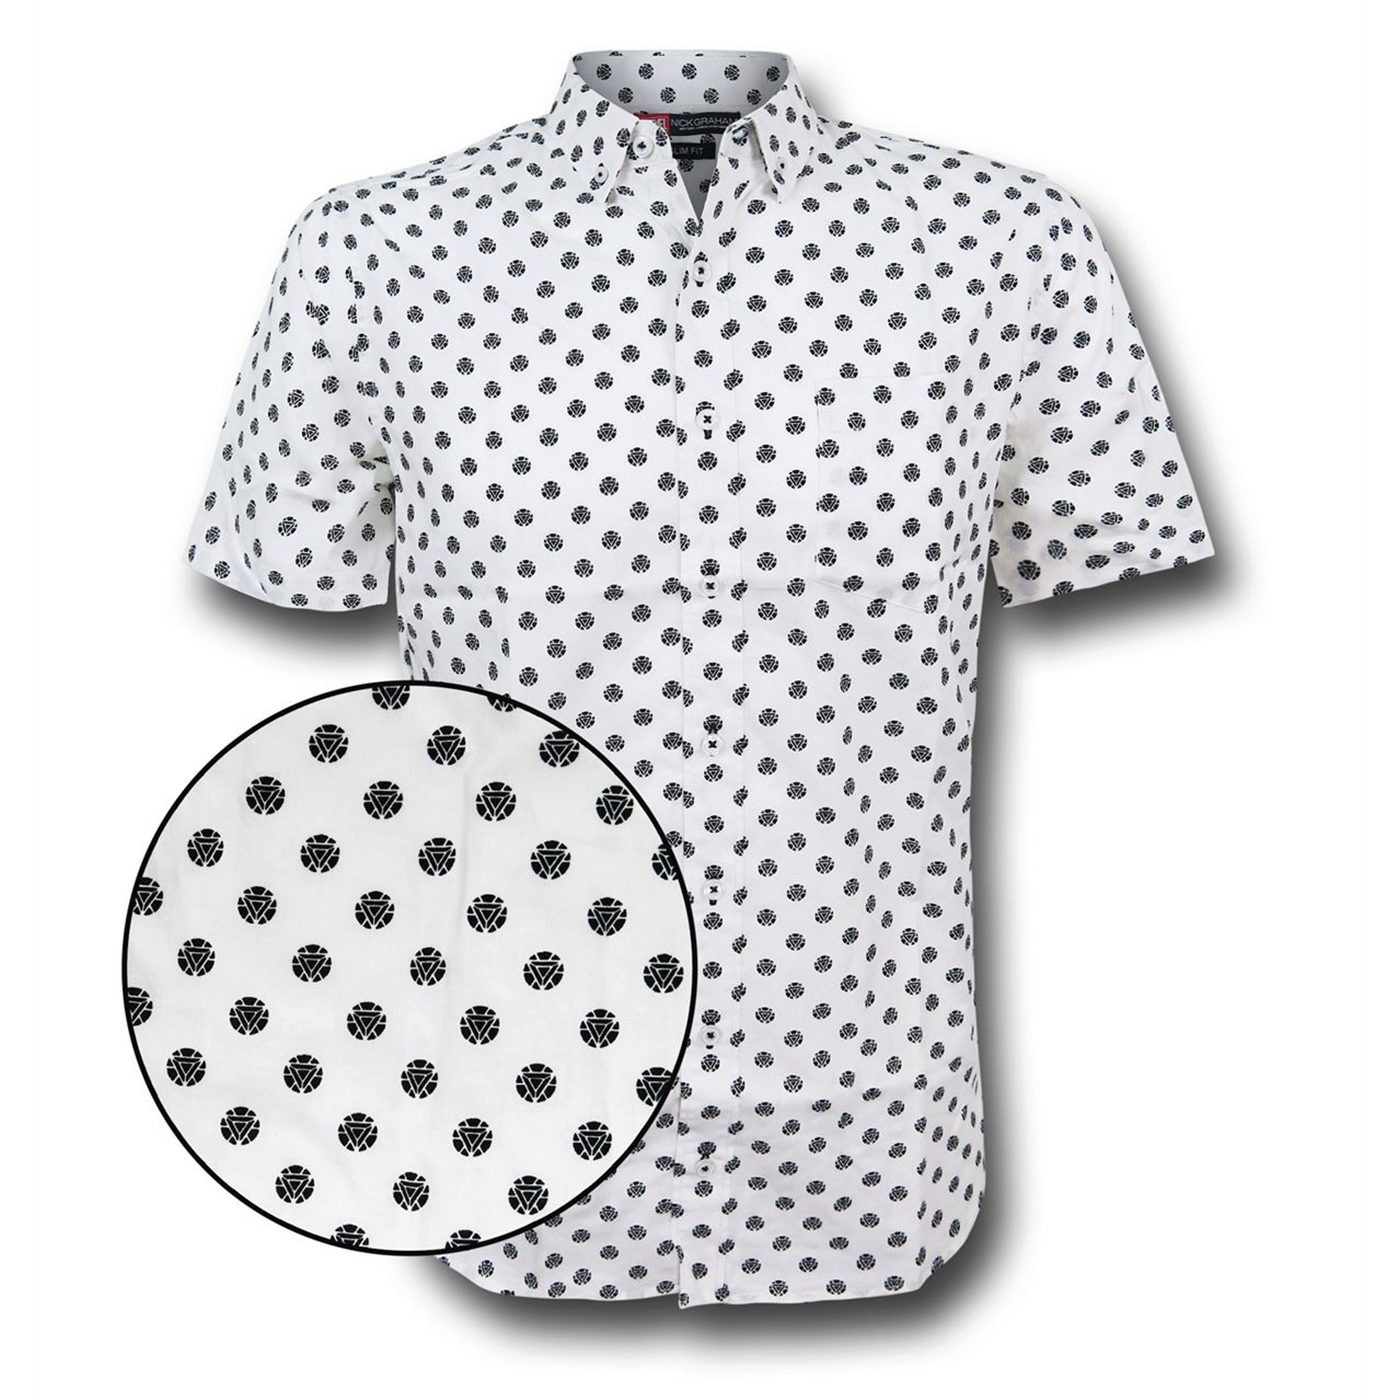 Iron Man Arc Reactor Men's Fitted Button Down Shirt